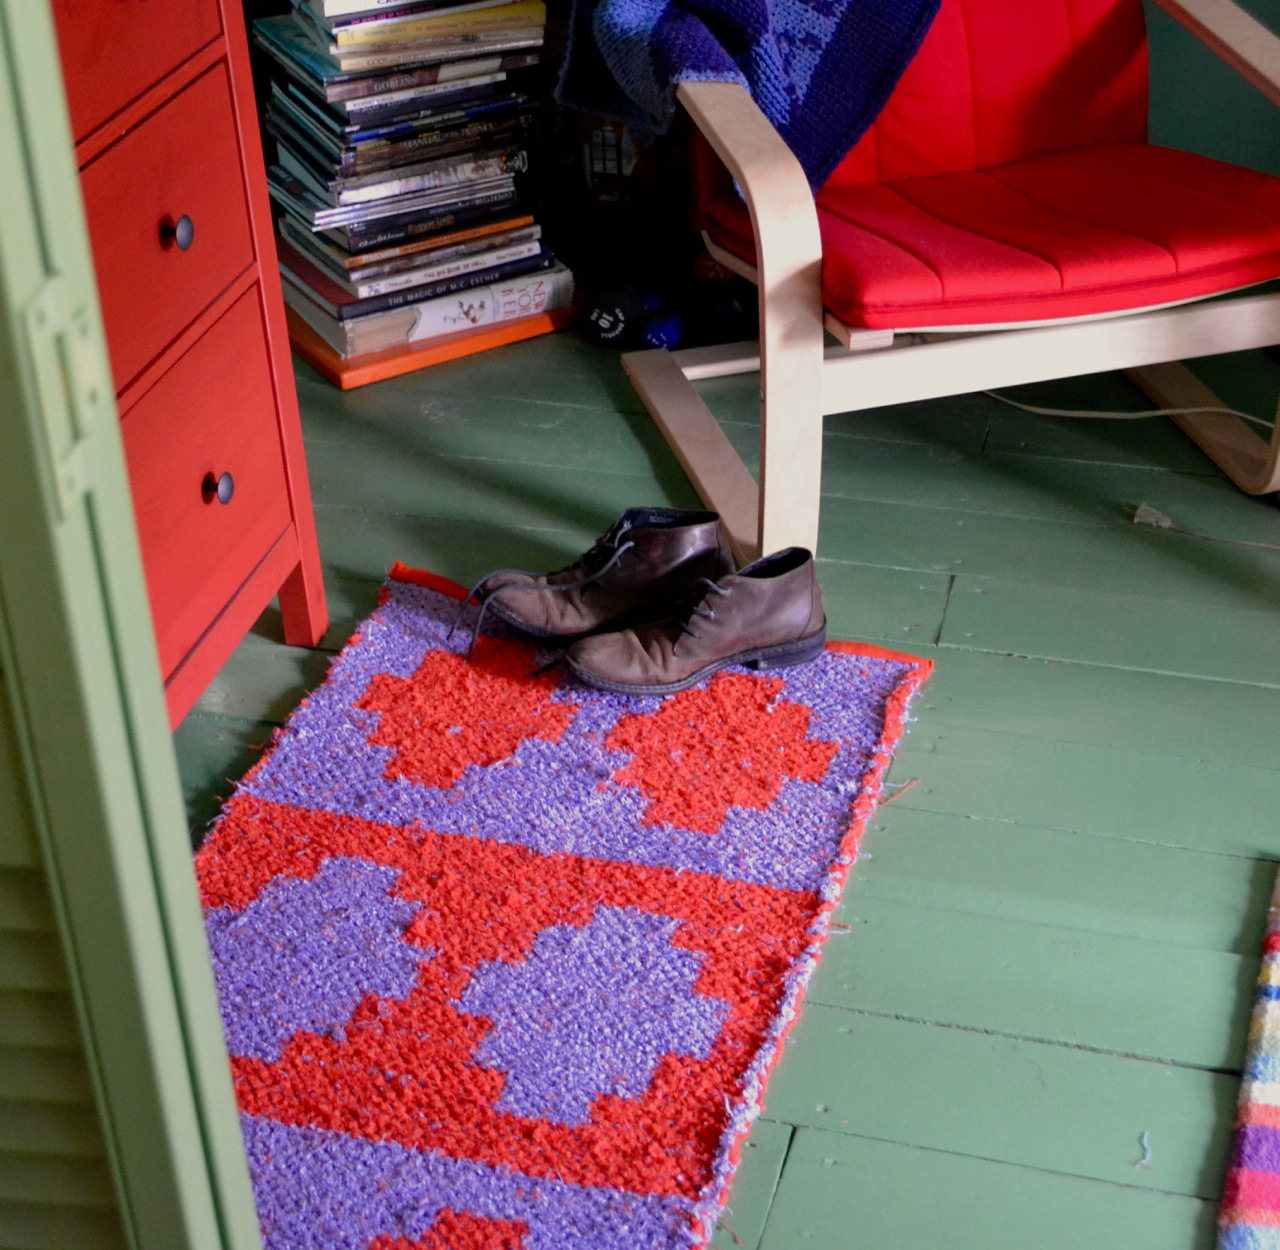 Cals rug